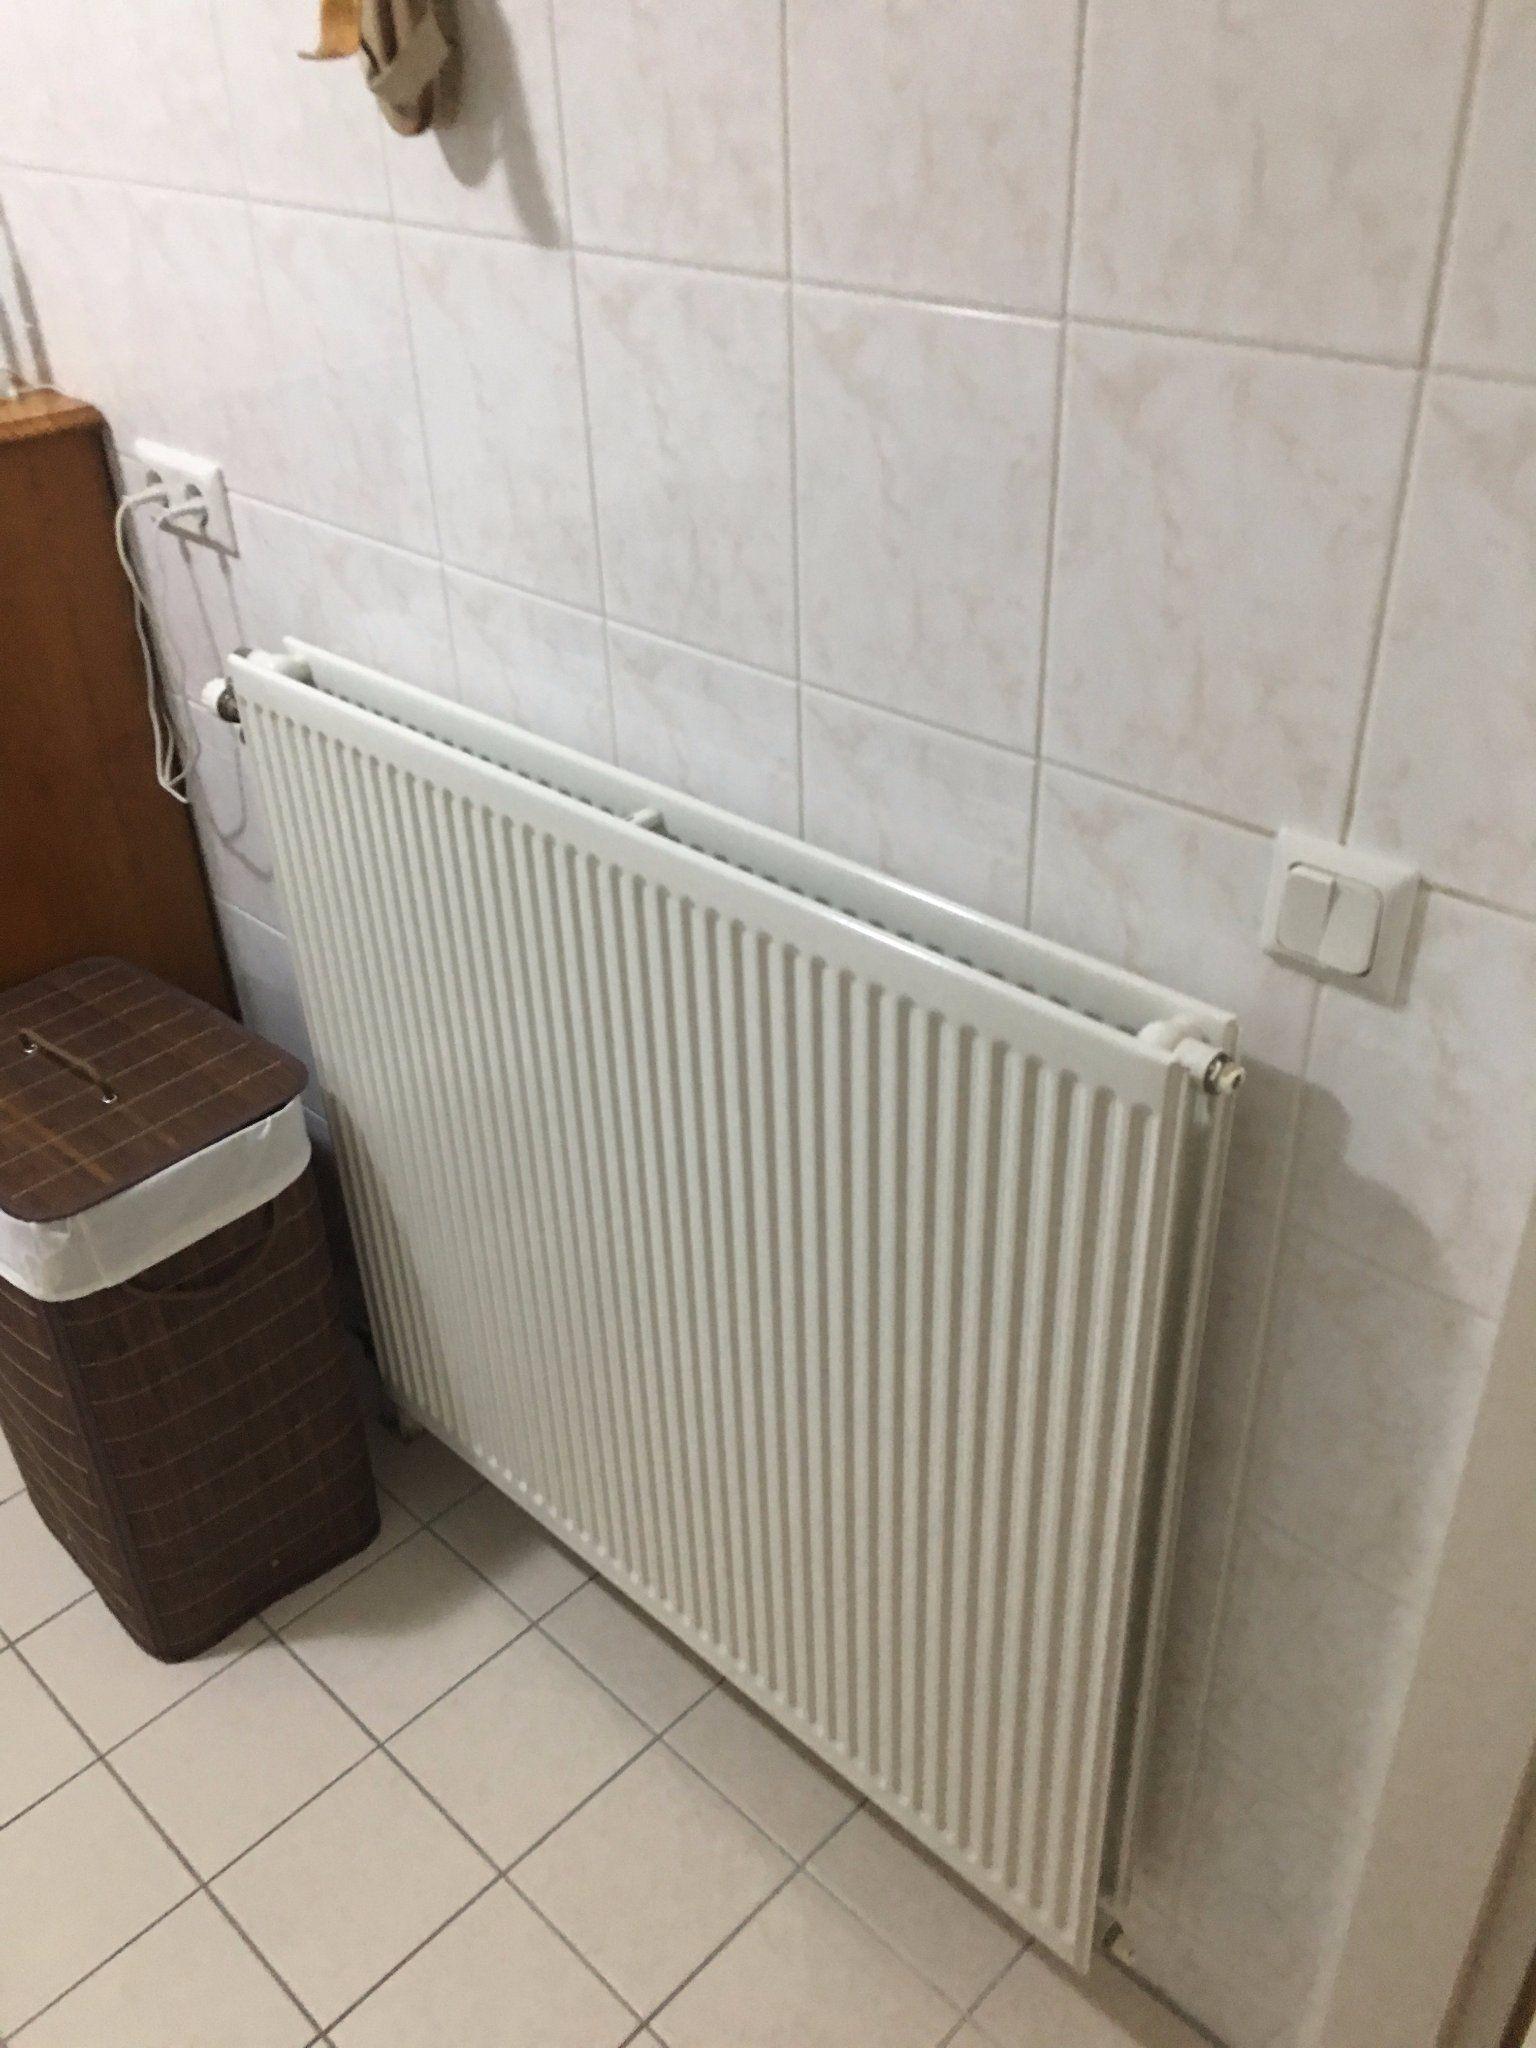 Renovatie Badkamer 2x3m Hoogwaardig 2 Toiletten Werkspot